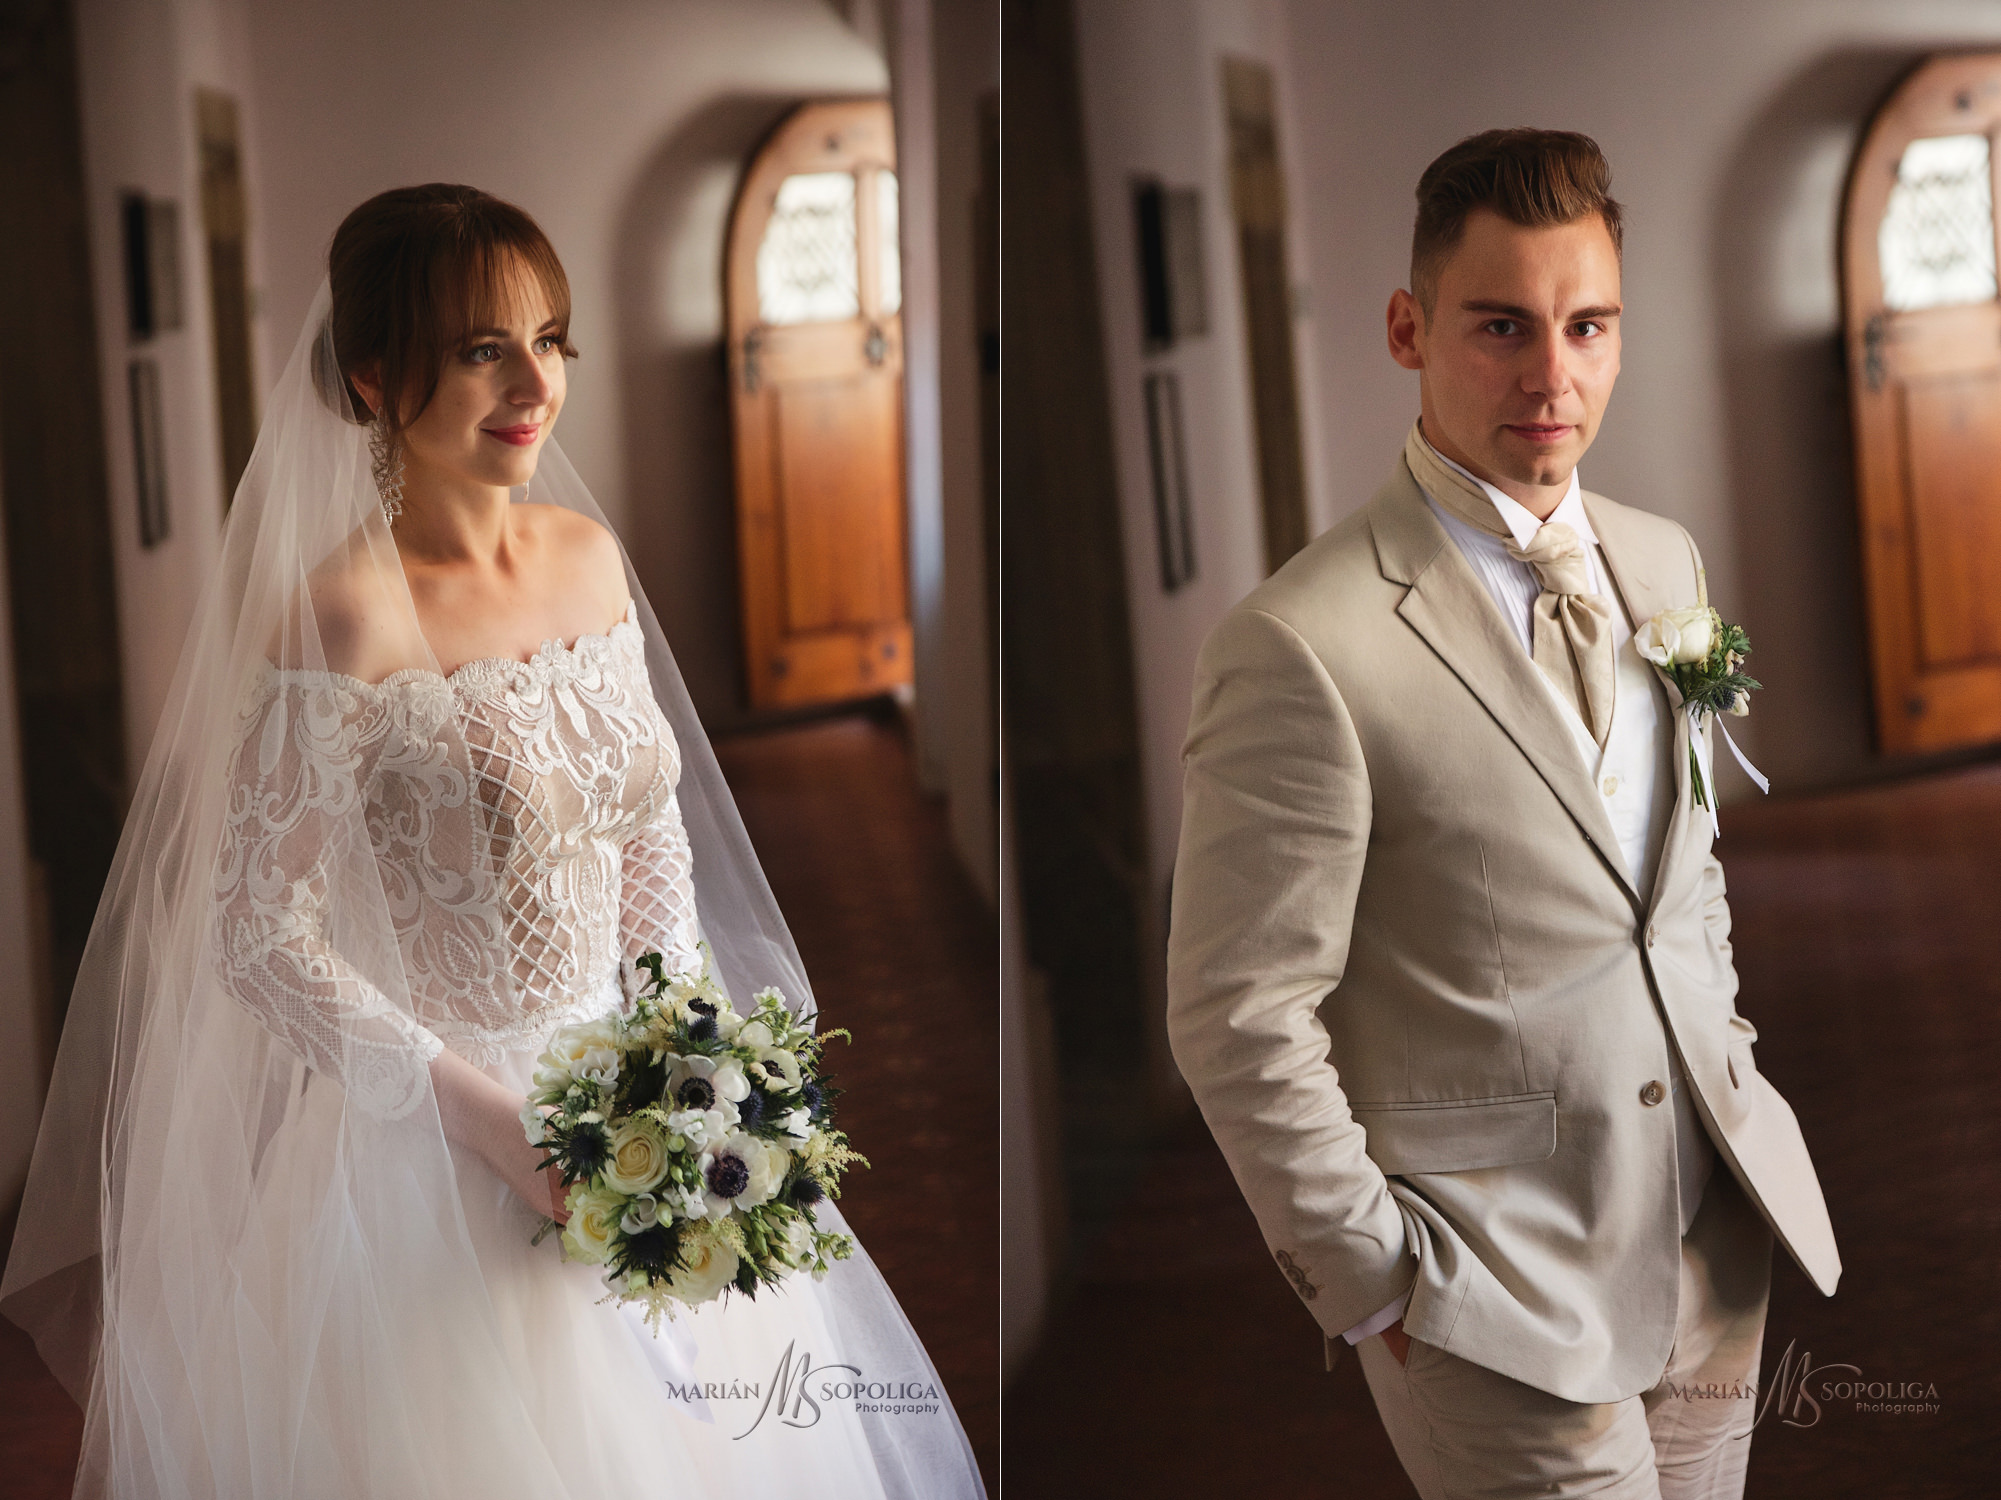 35portretni-svatebni-fotky-novomazelu-v-interieru-statniho-hradu